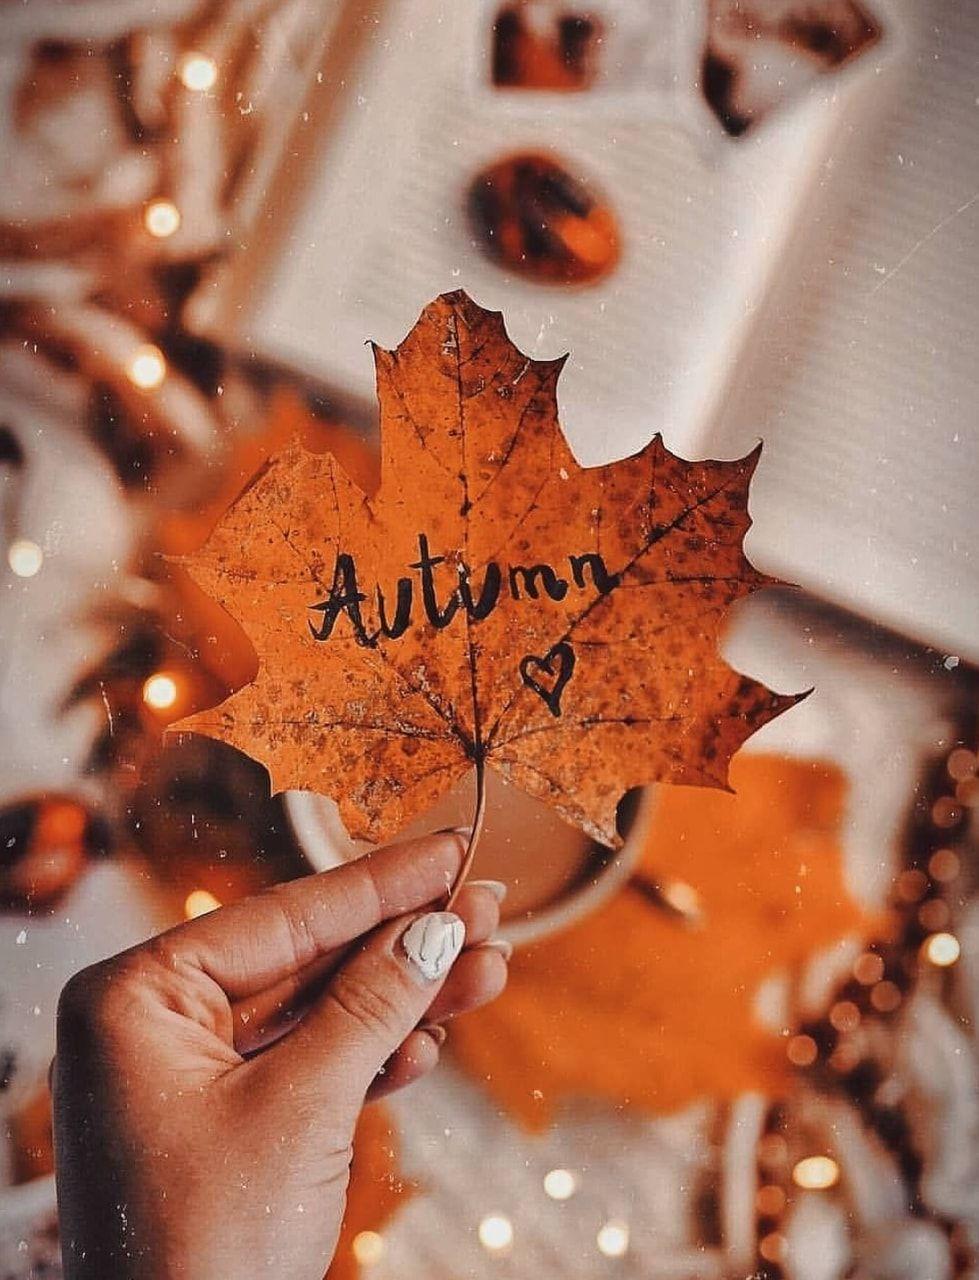 Autumn ♥ uploaded by SHIFA° on We Heart It